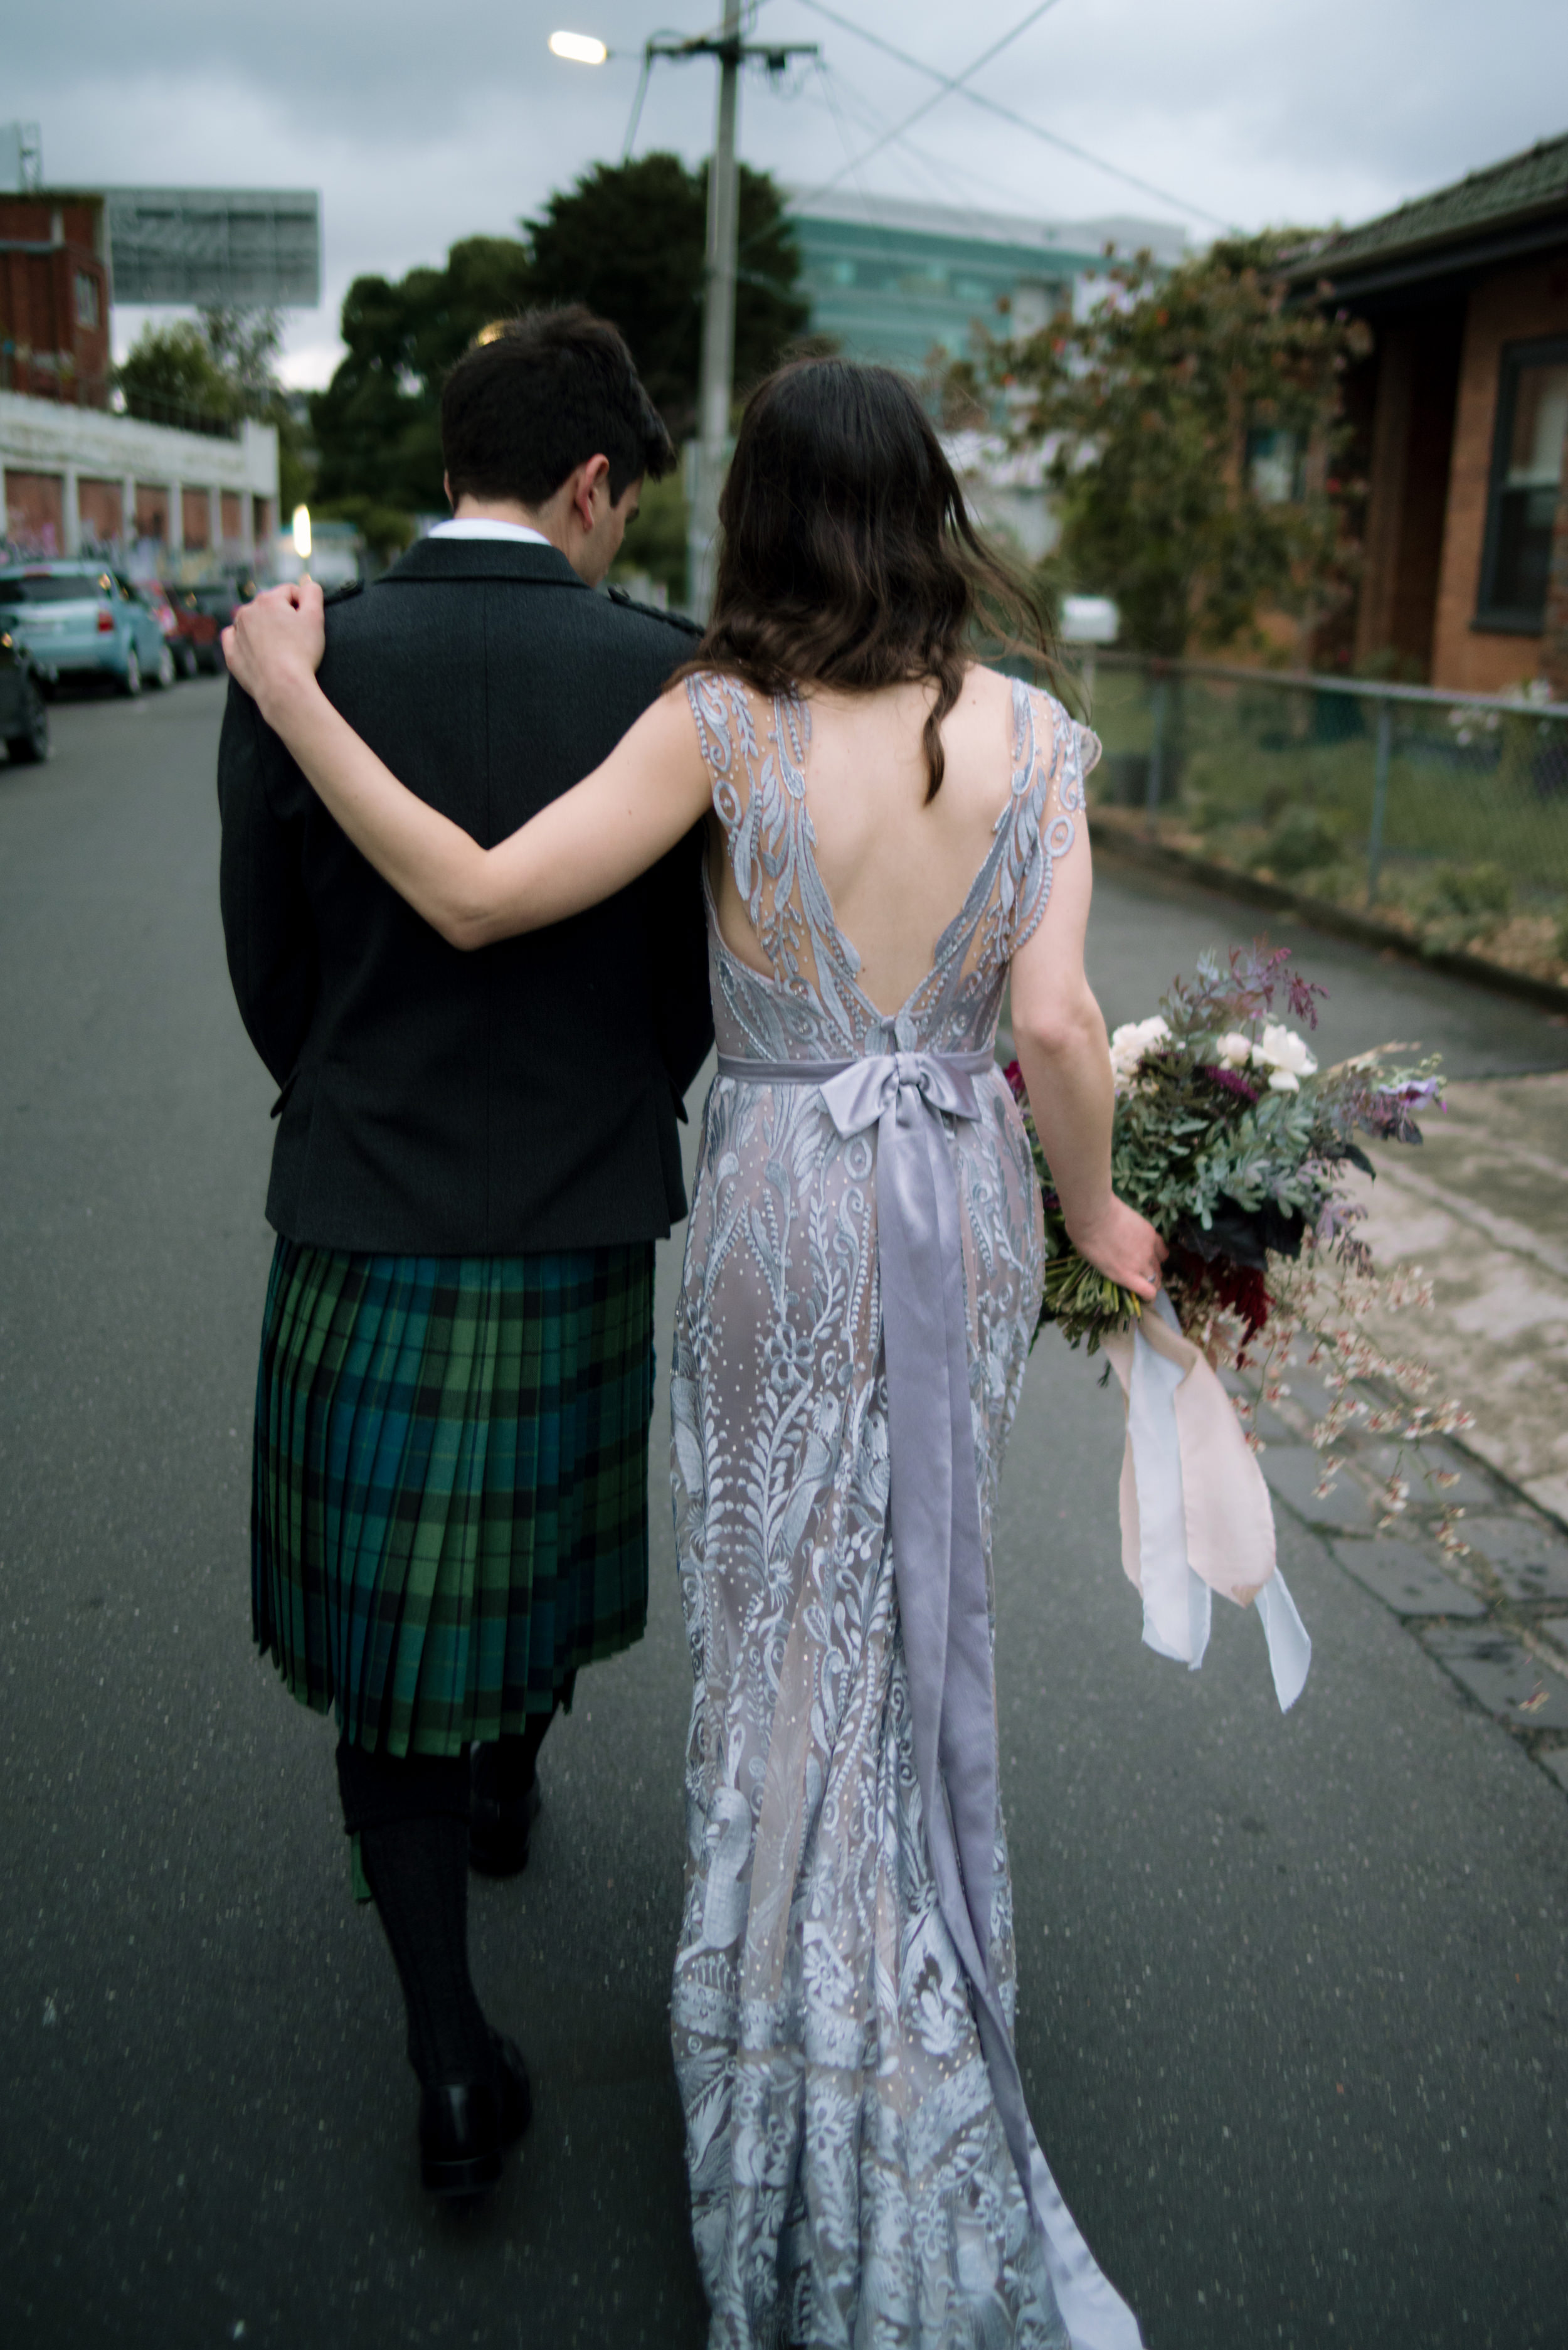 I-Got-You-Babe-&.Co.-Glasshaus-Wedding-Charlotte-Cameron0110.JPG